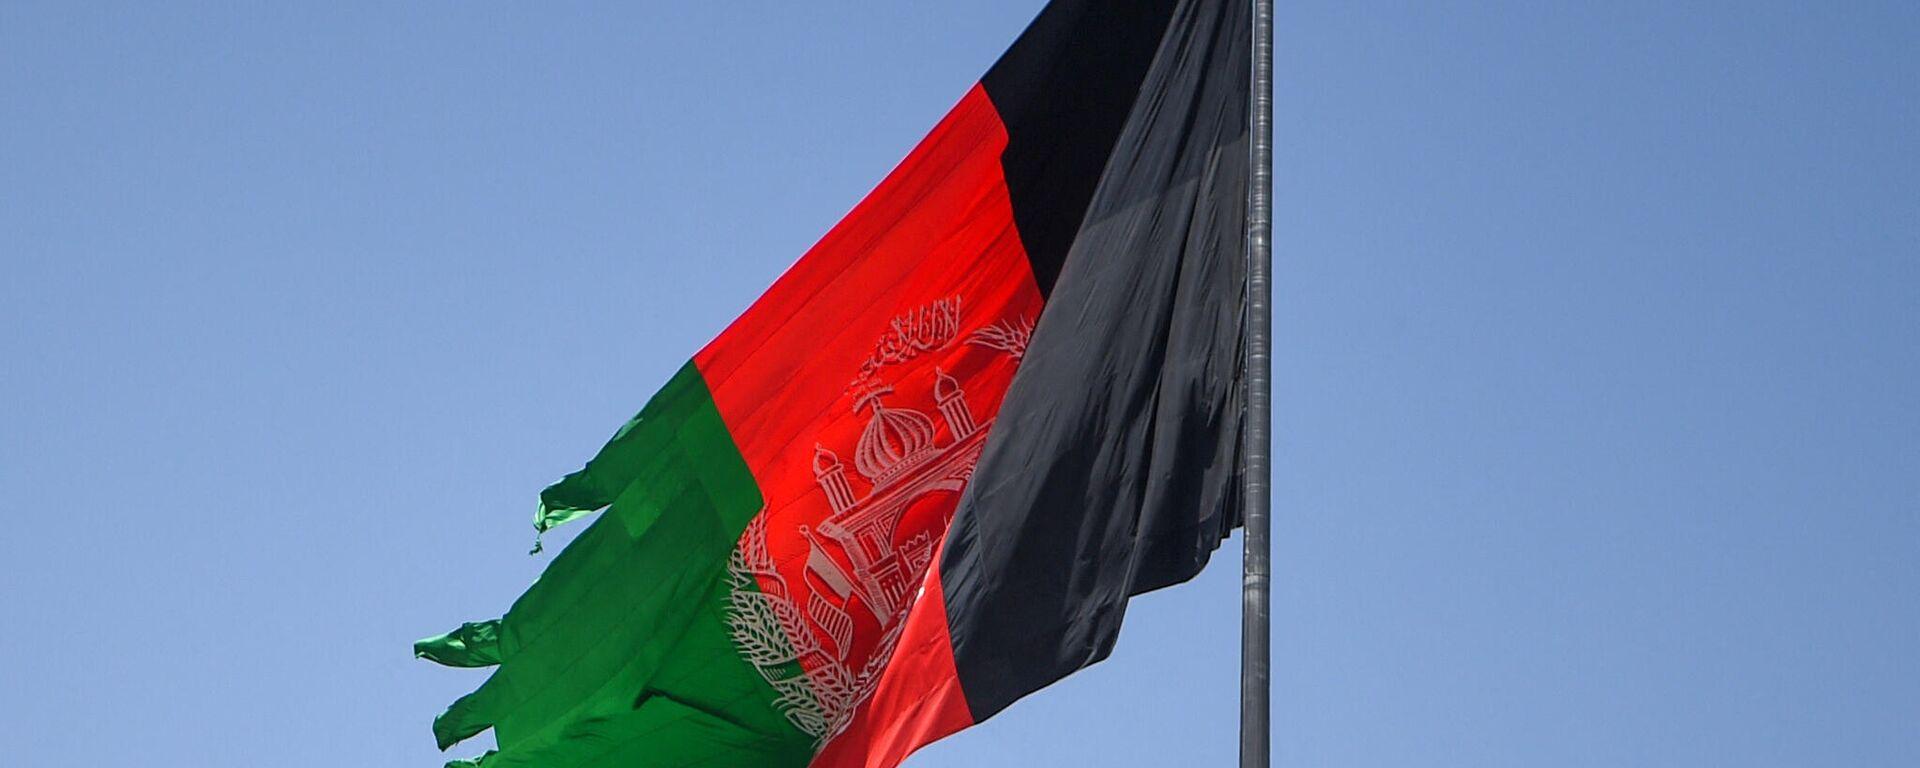 Bandera de Afganistán - Sputnik Mundo, 1920, 17.03.2021